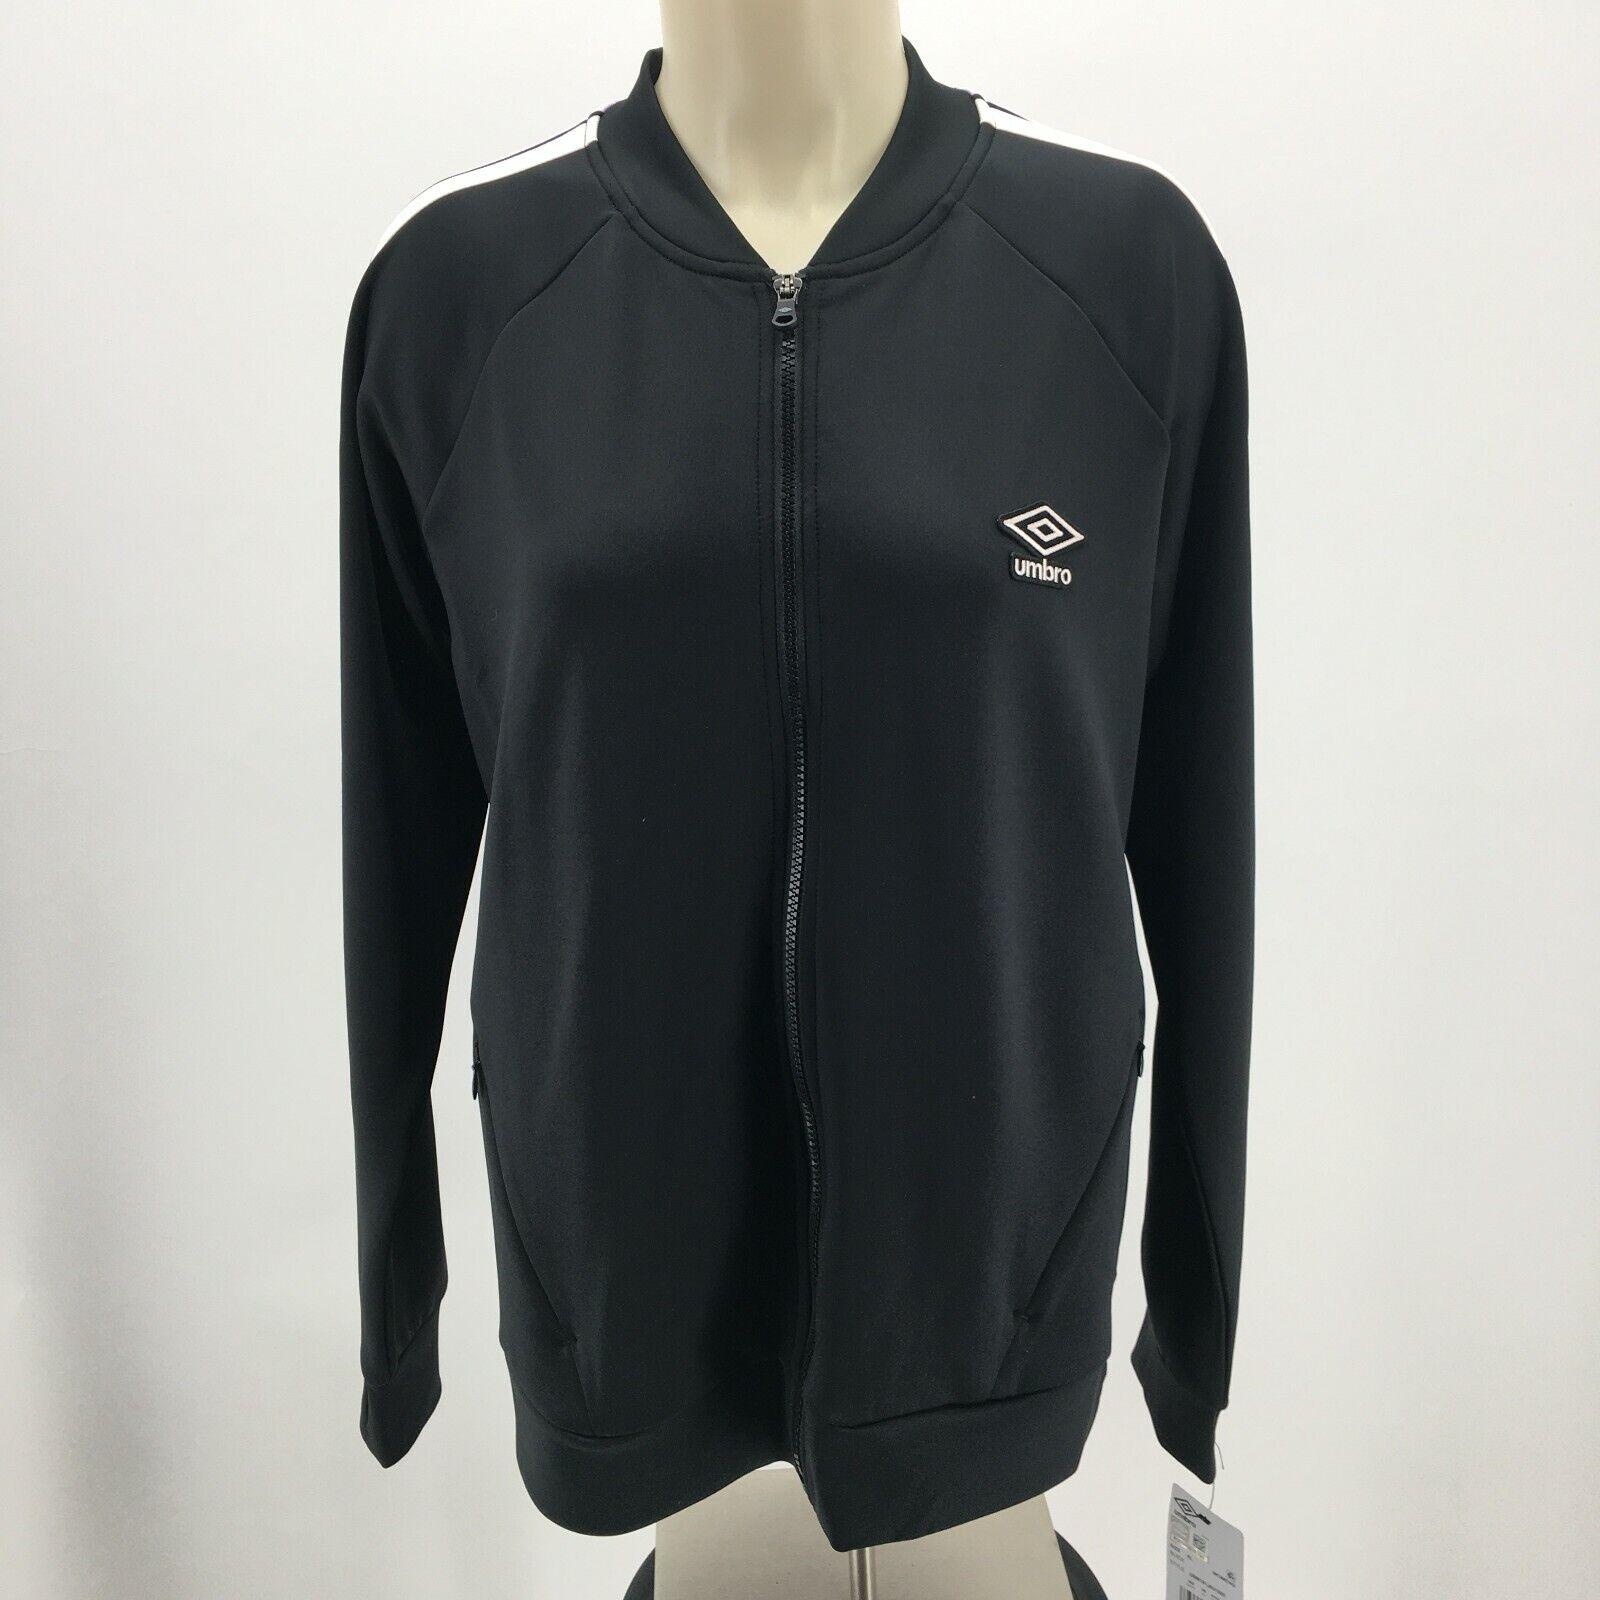 NWT Umbro Full Zip Athletic Track Jacket Long Sleeves Activewear Black Womens XL